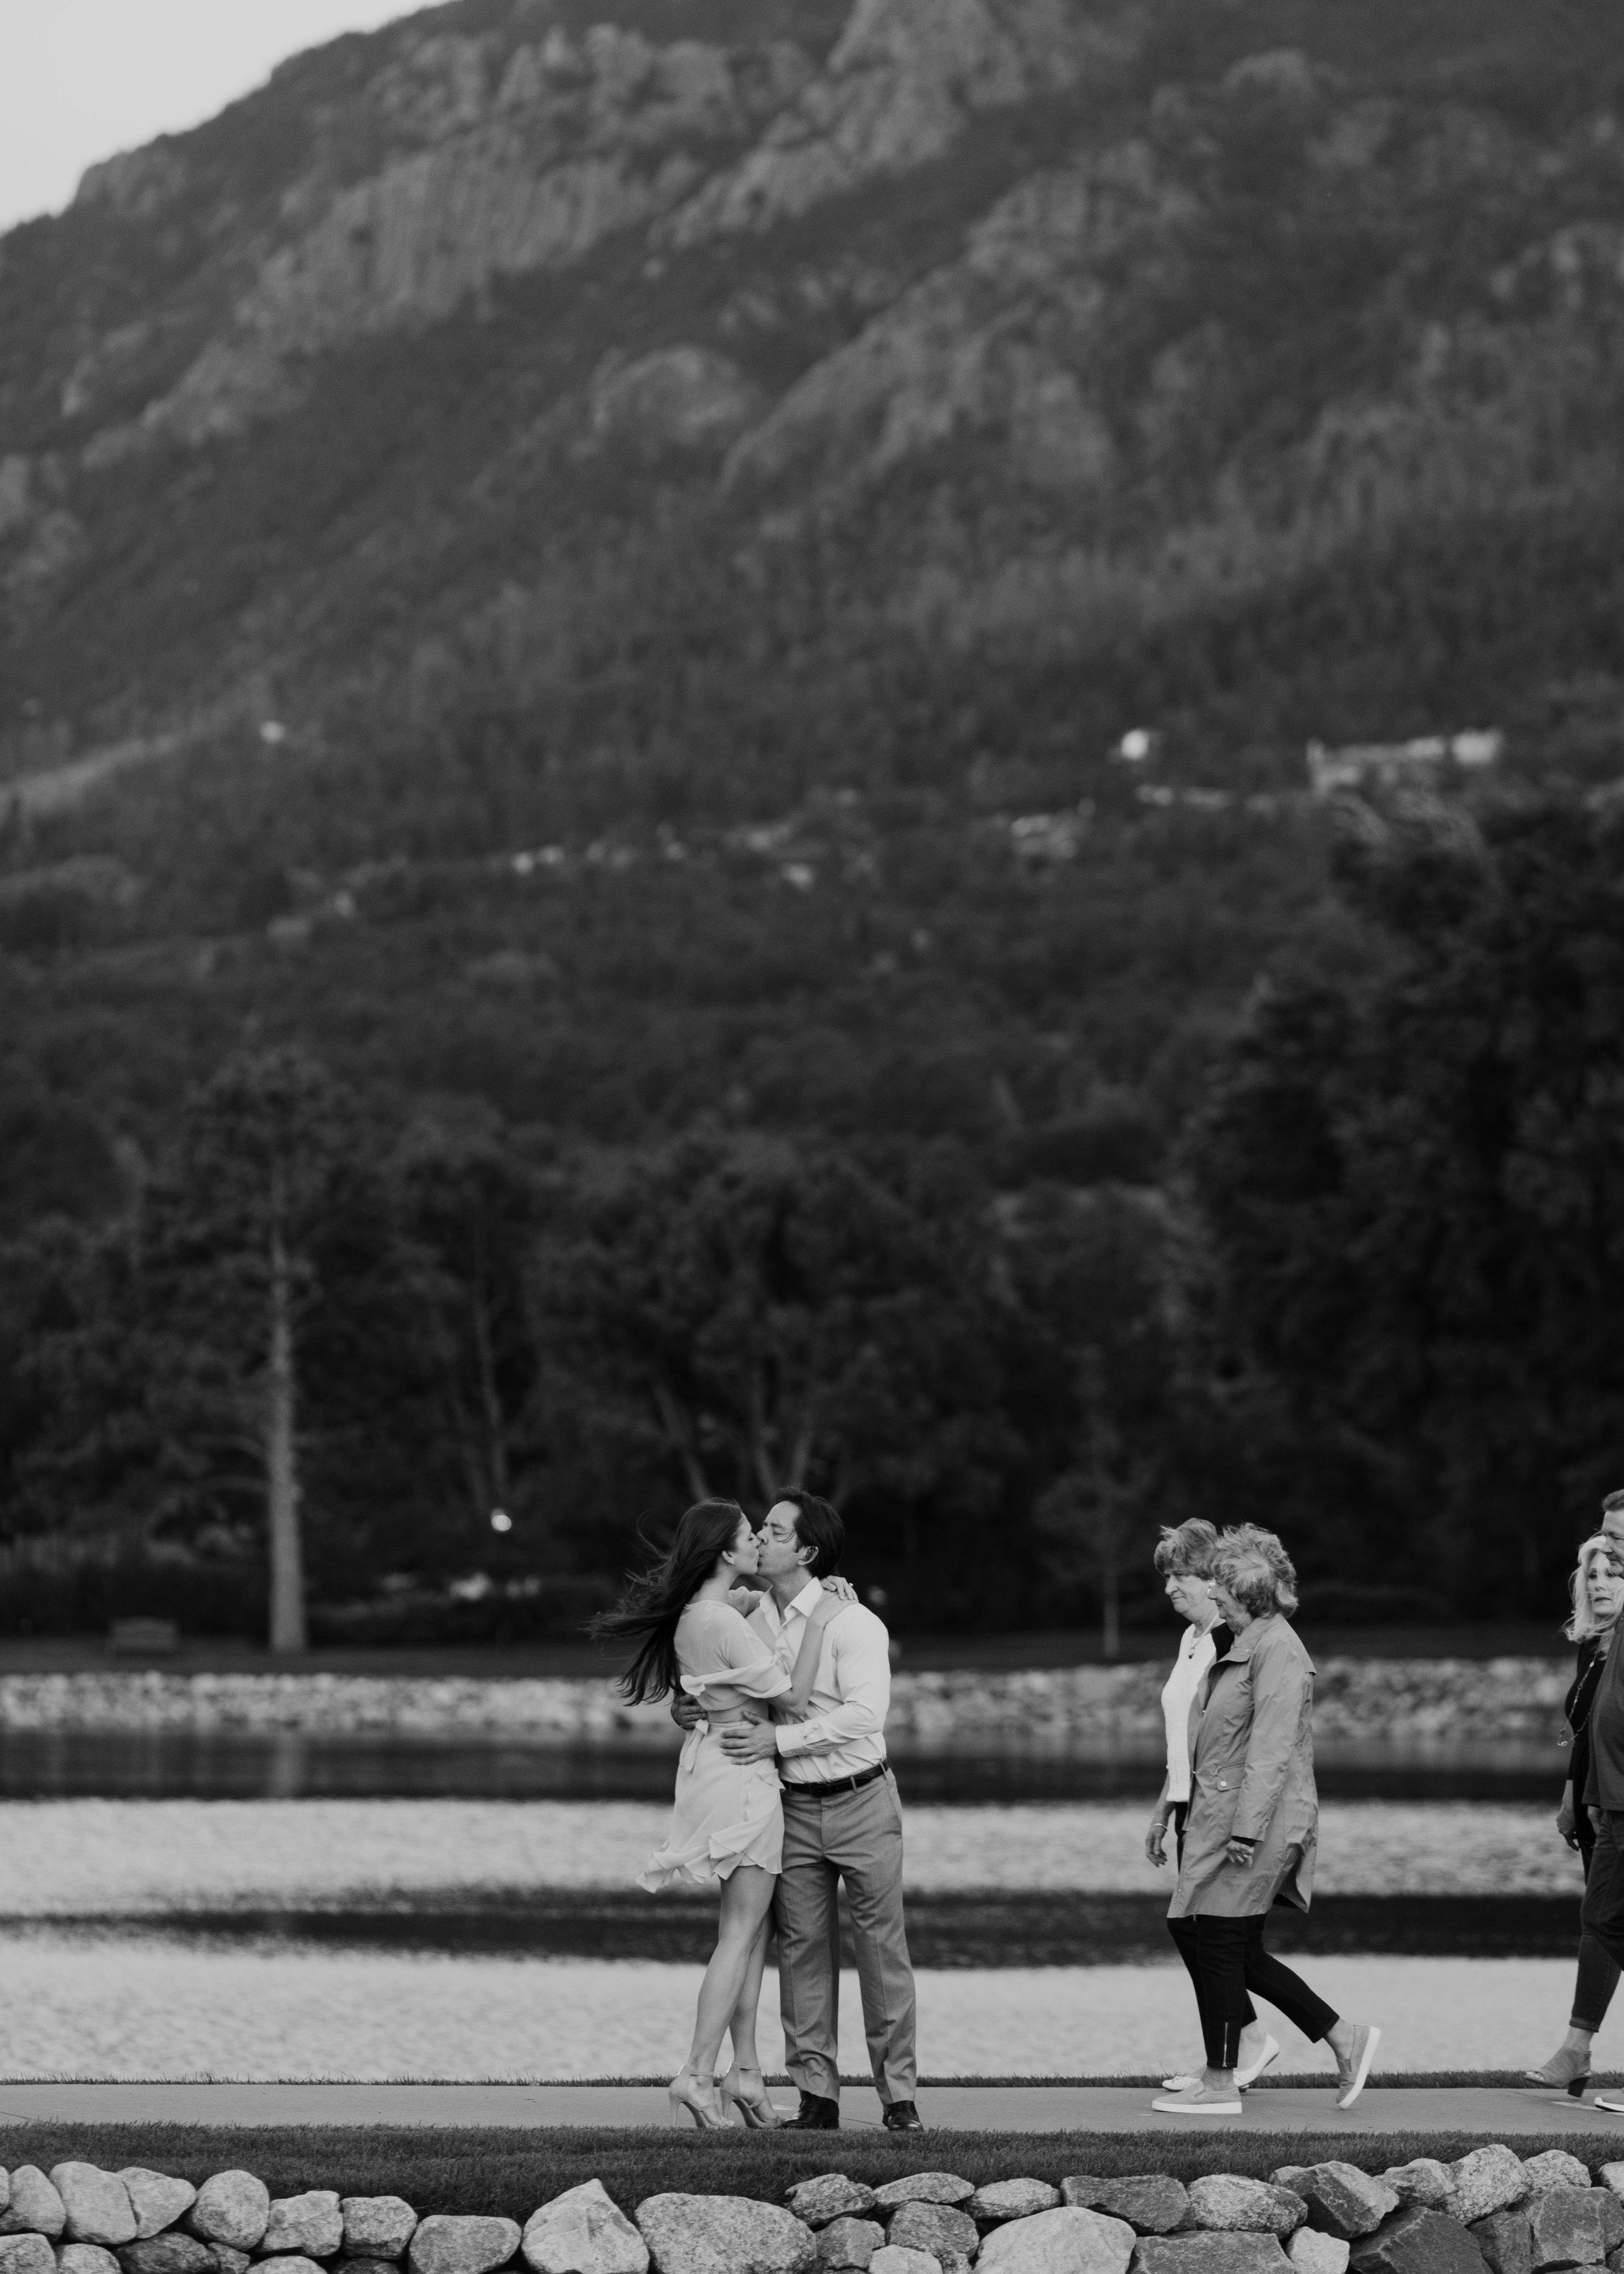 broadmoor-engagement-photography-50.jpg